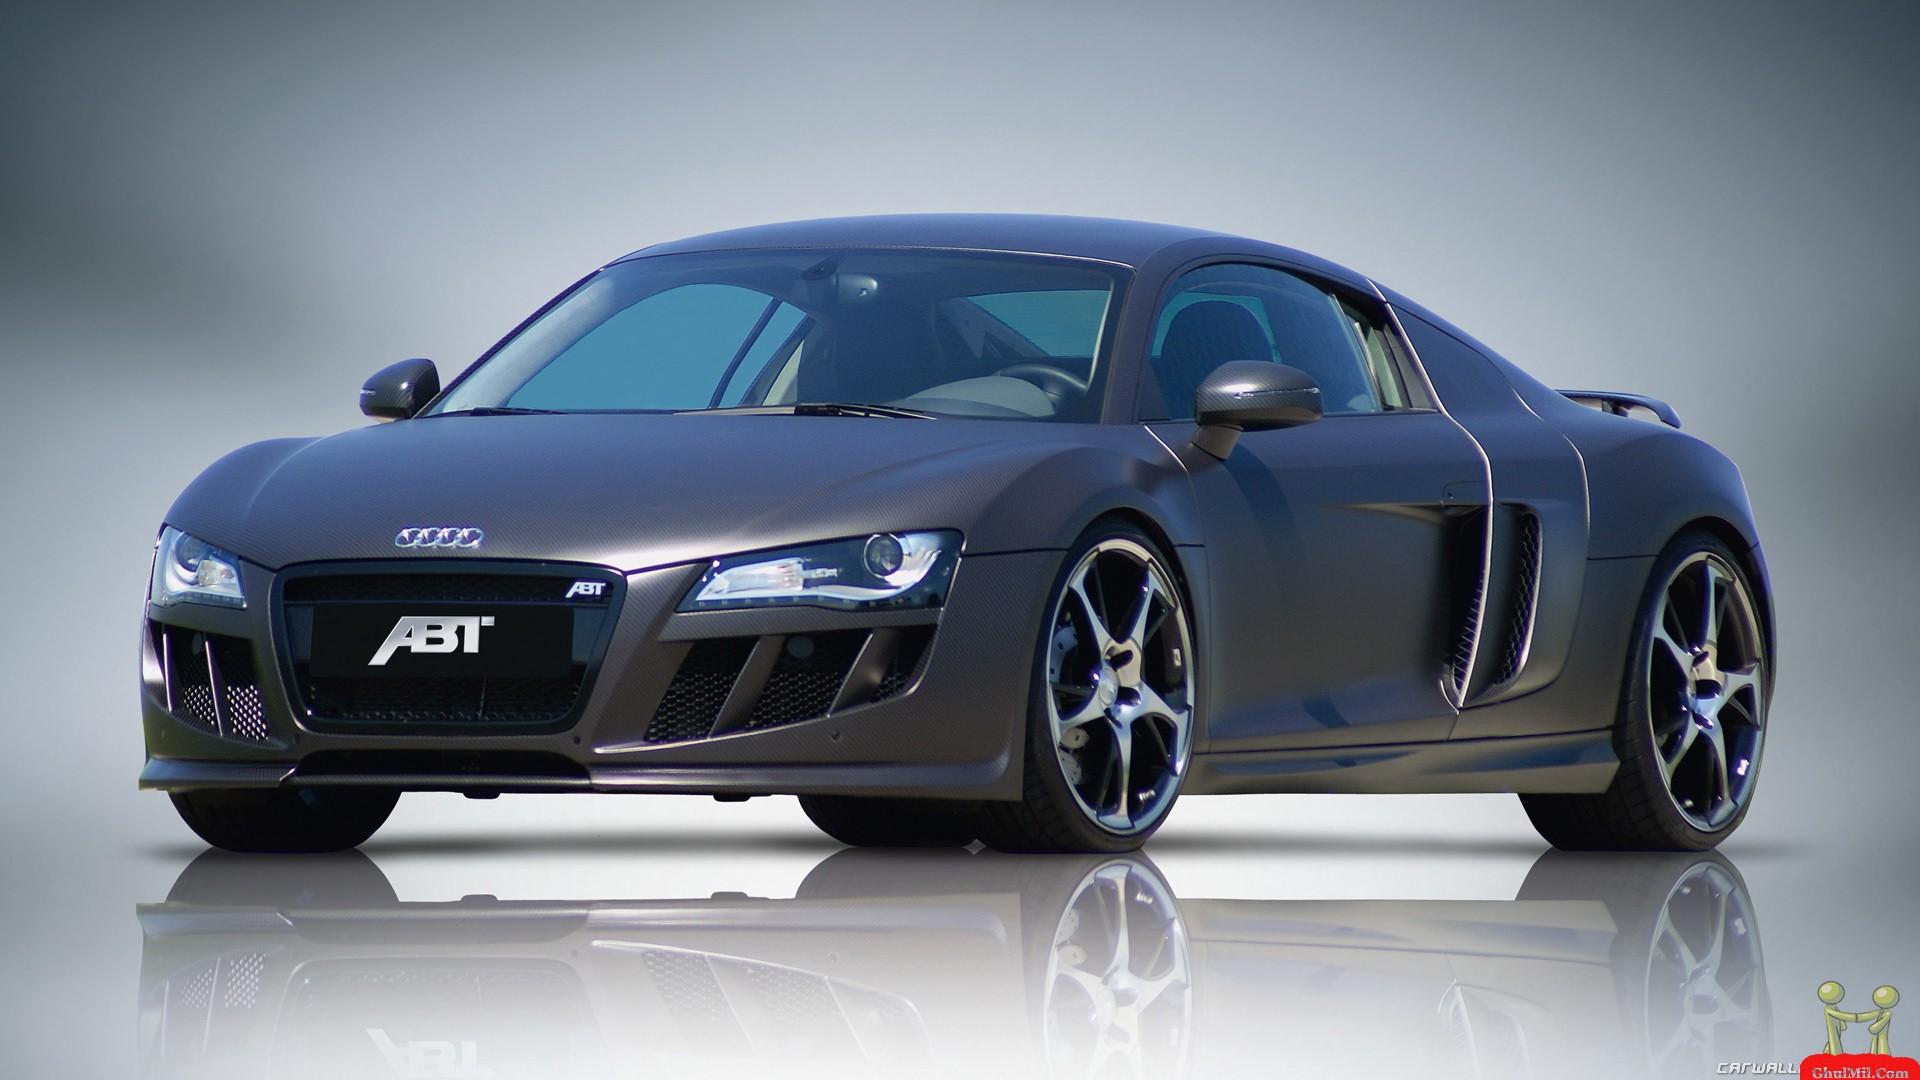 New Audi Car Hd Wallpapers Pics Tracksbrewpubbramptoncom Audi - Audi car models with price